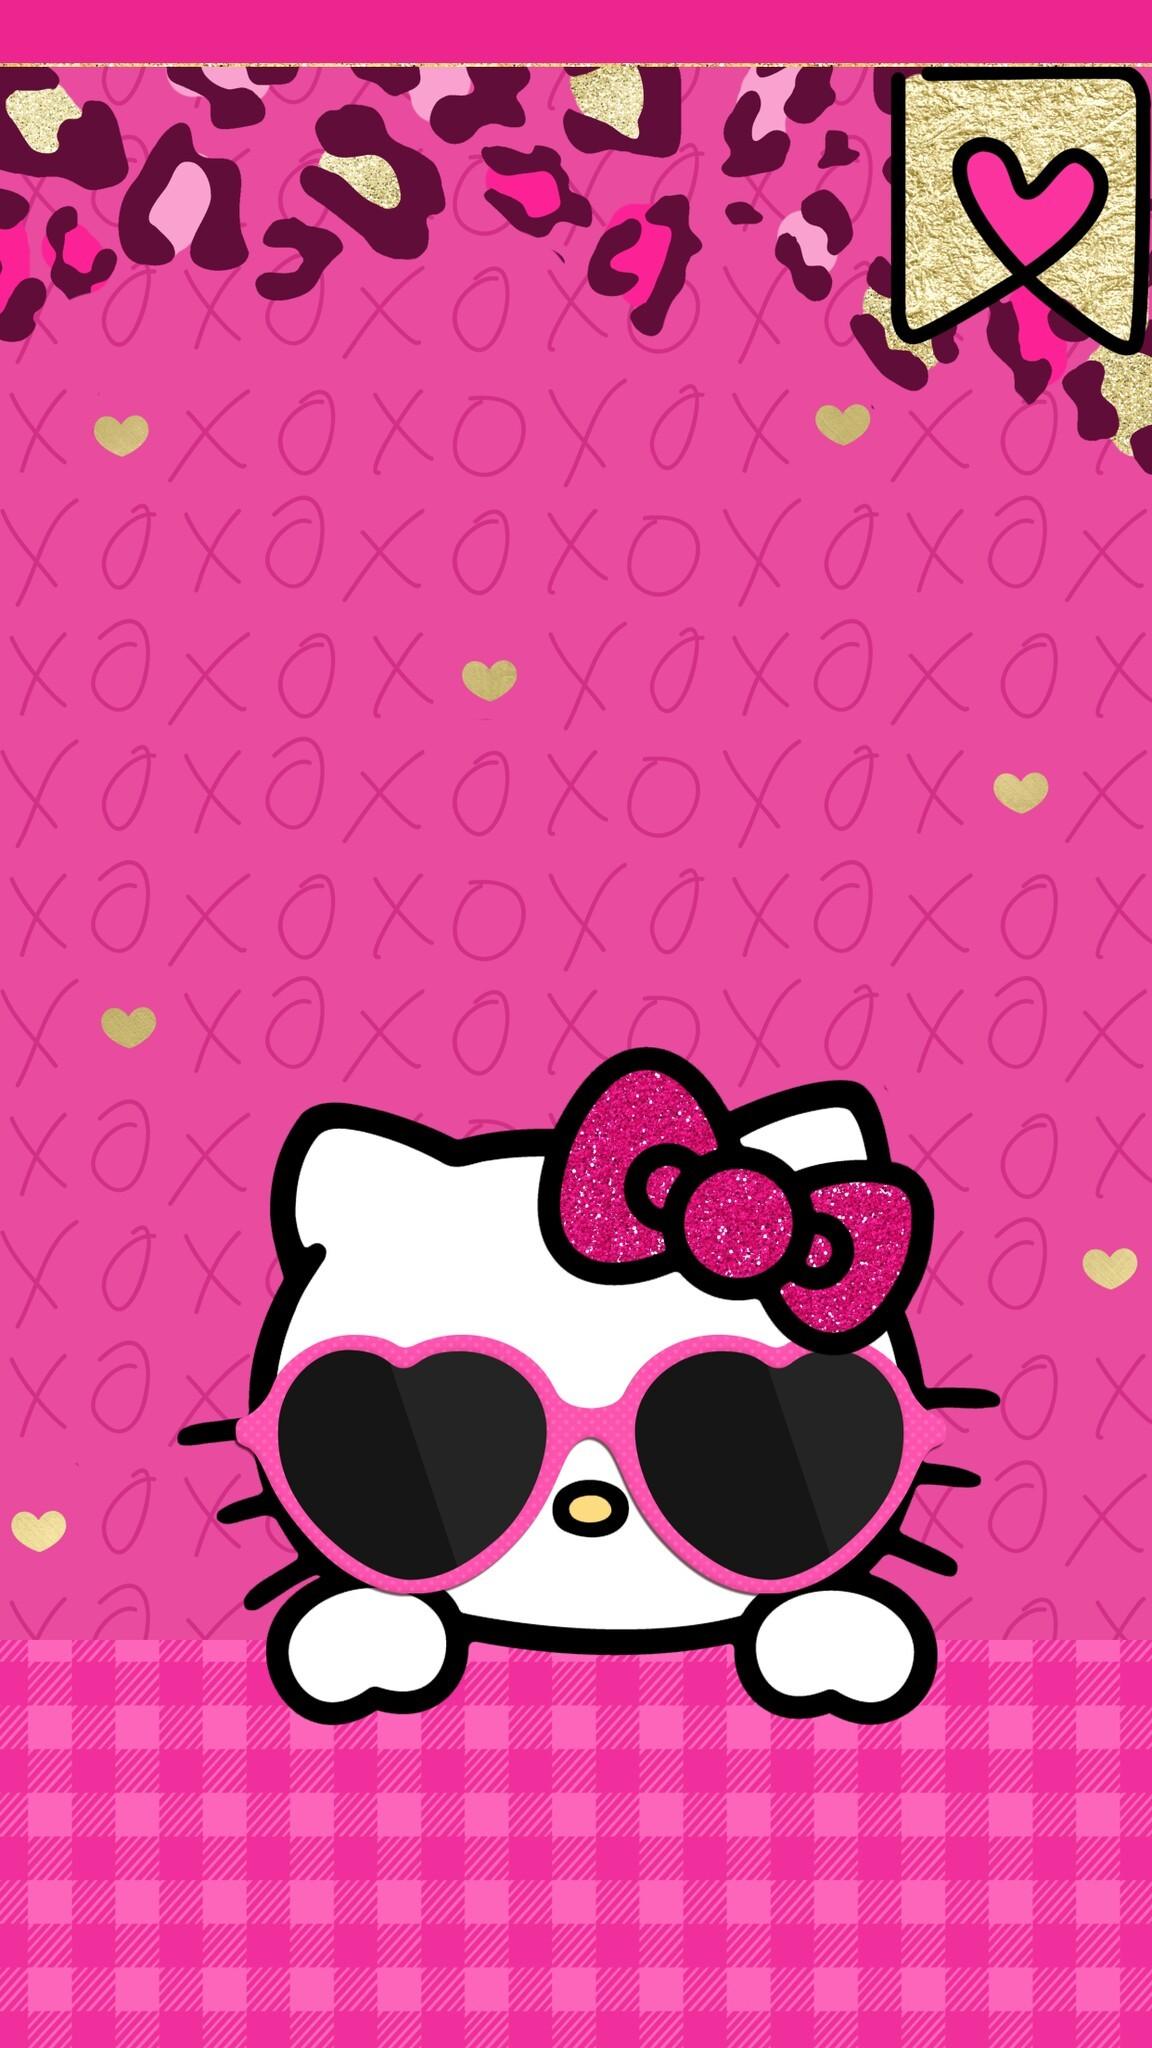 Sanrio Wallpaper, Hello Kitty Wallpaper, Phone Wallpapers, Blog, Phones,  Iphone Funds, Screen